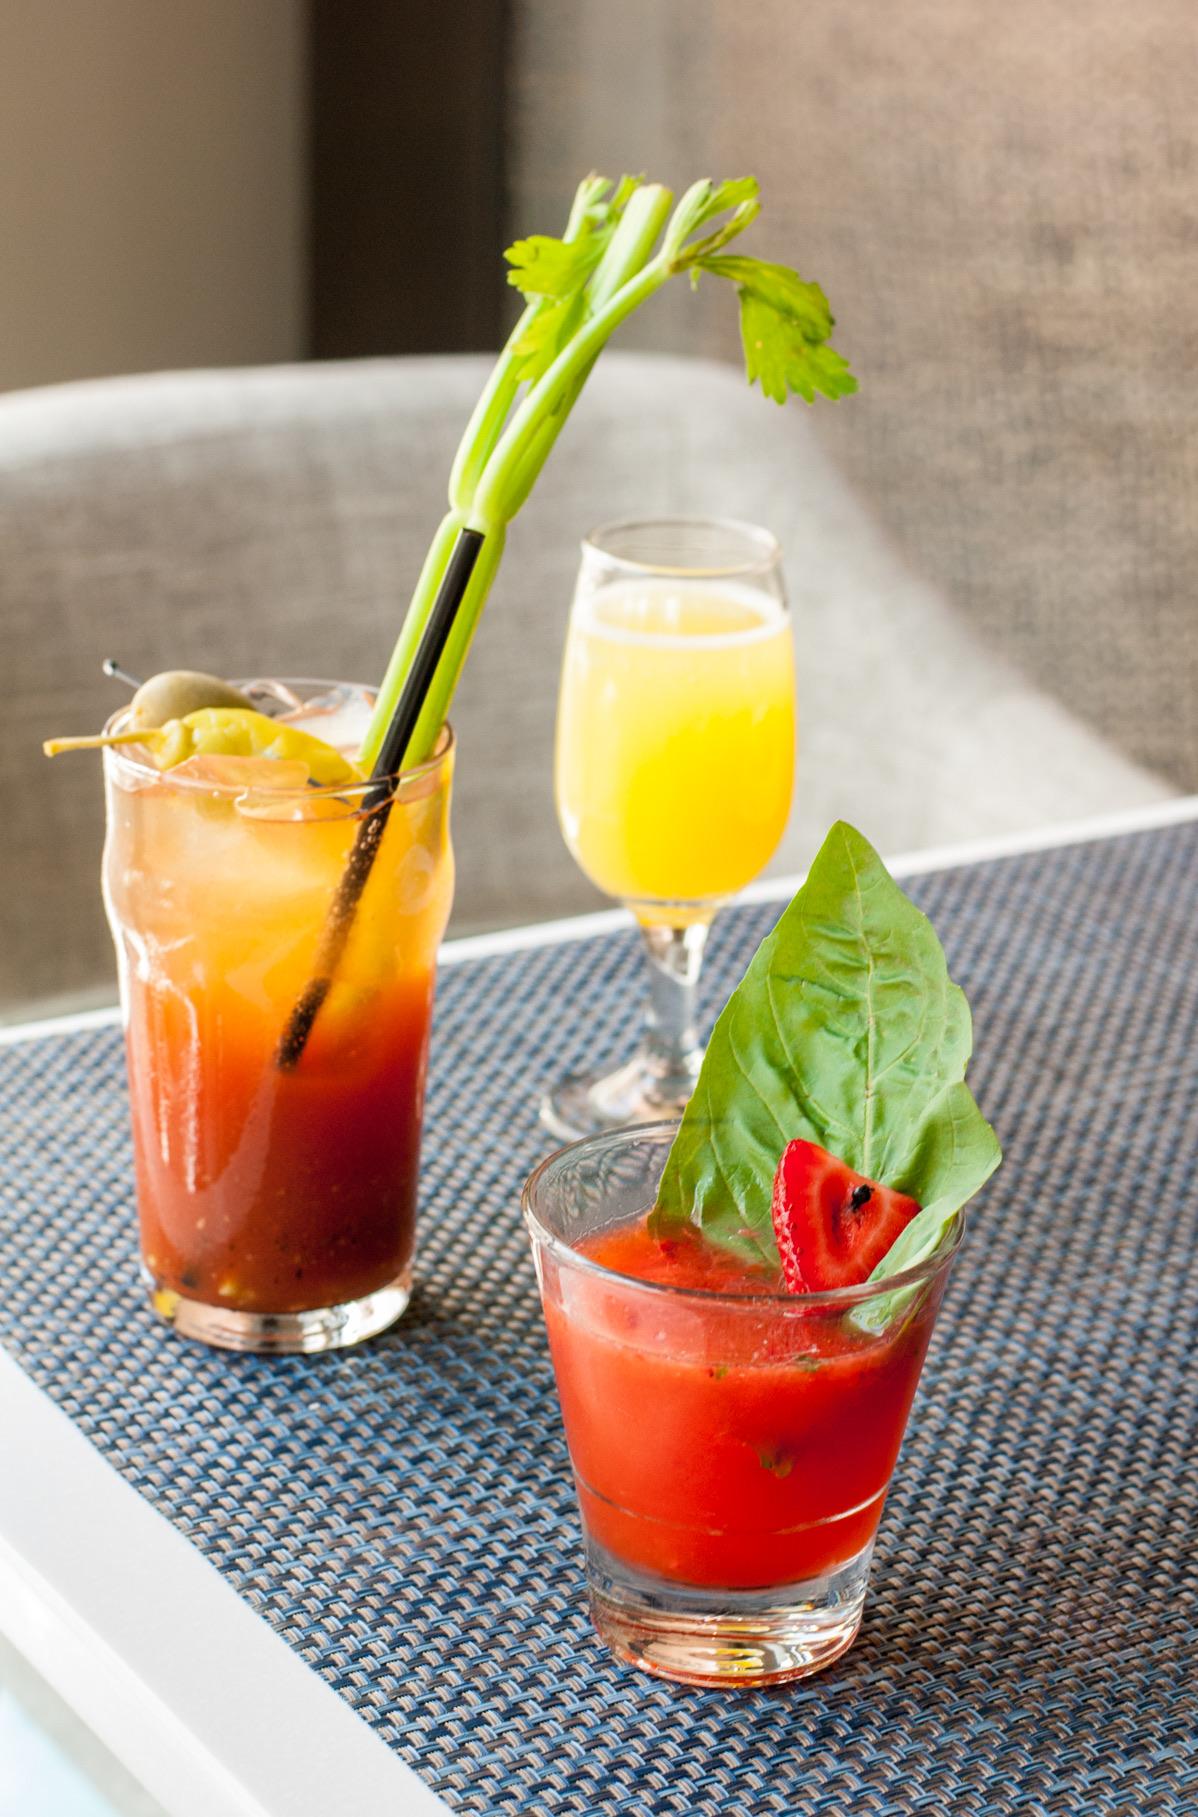 Bloody Mary, Mimosa, and Strawberry Basil Martini at Beachside Restaurant & Bar, Marina del Rey, CA